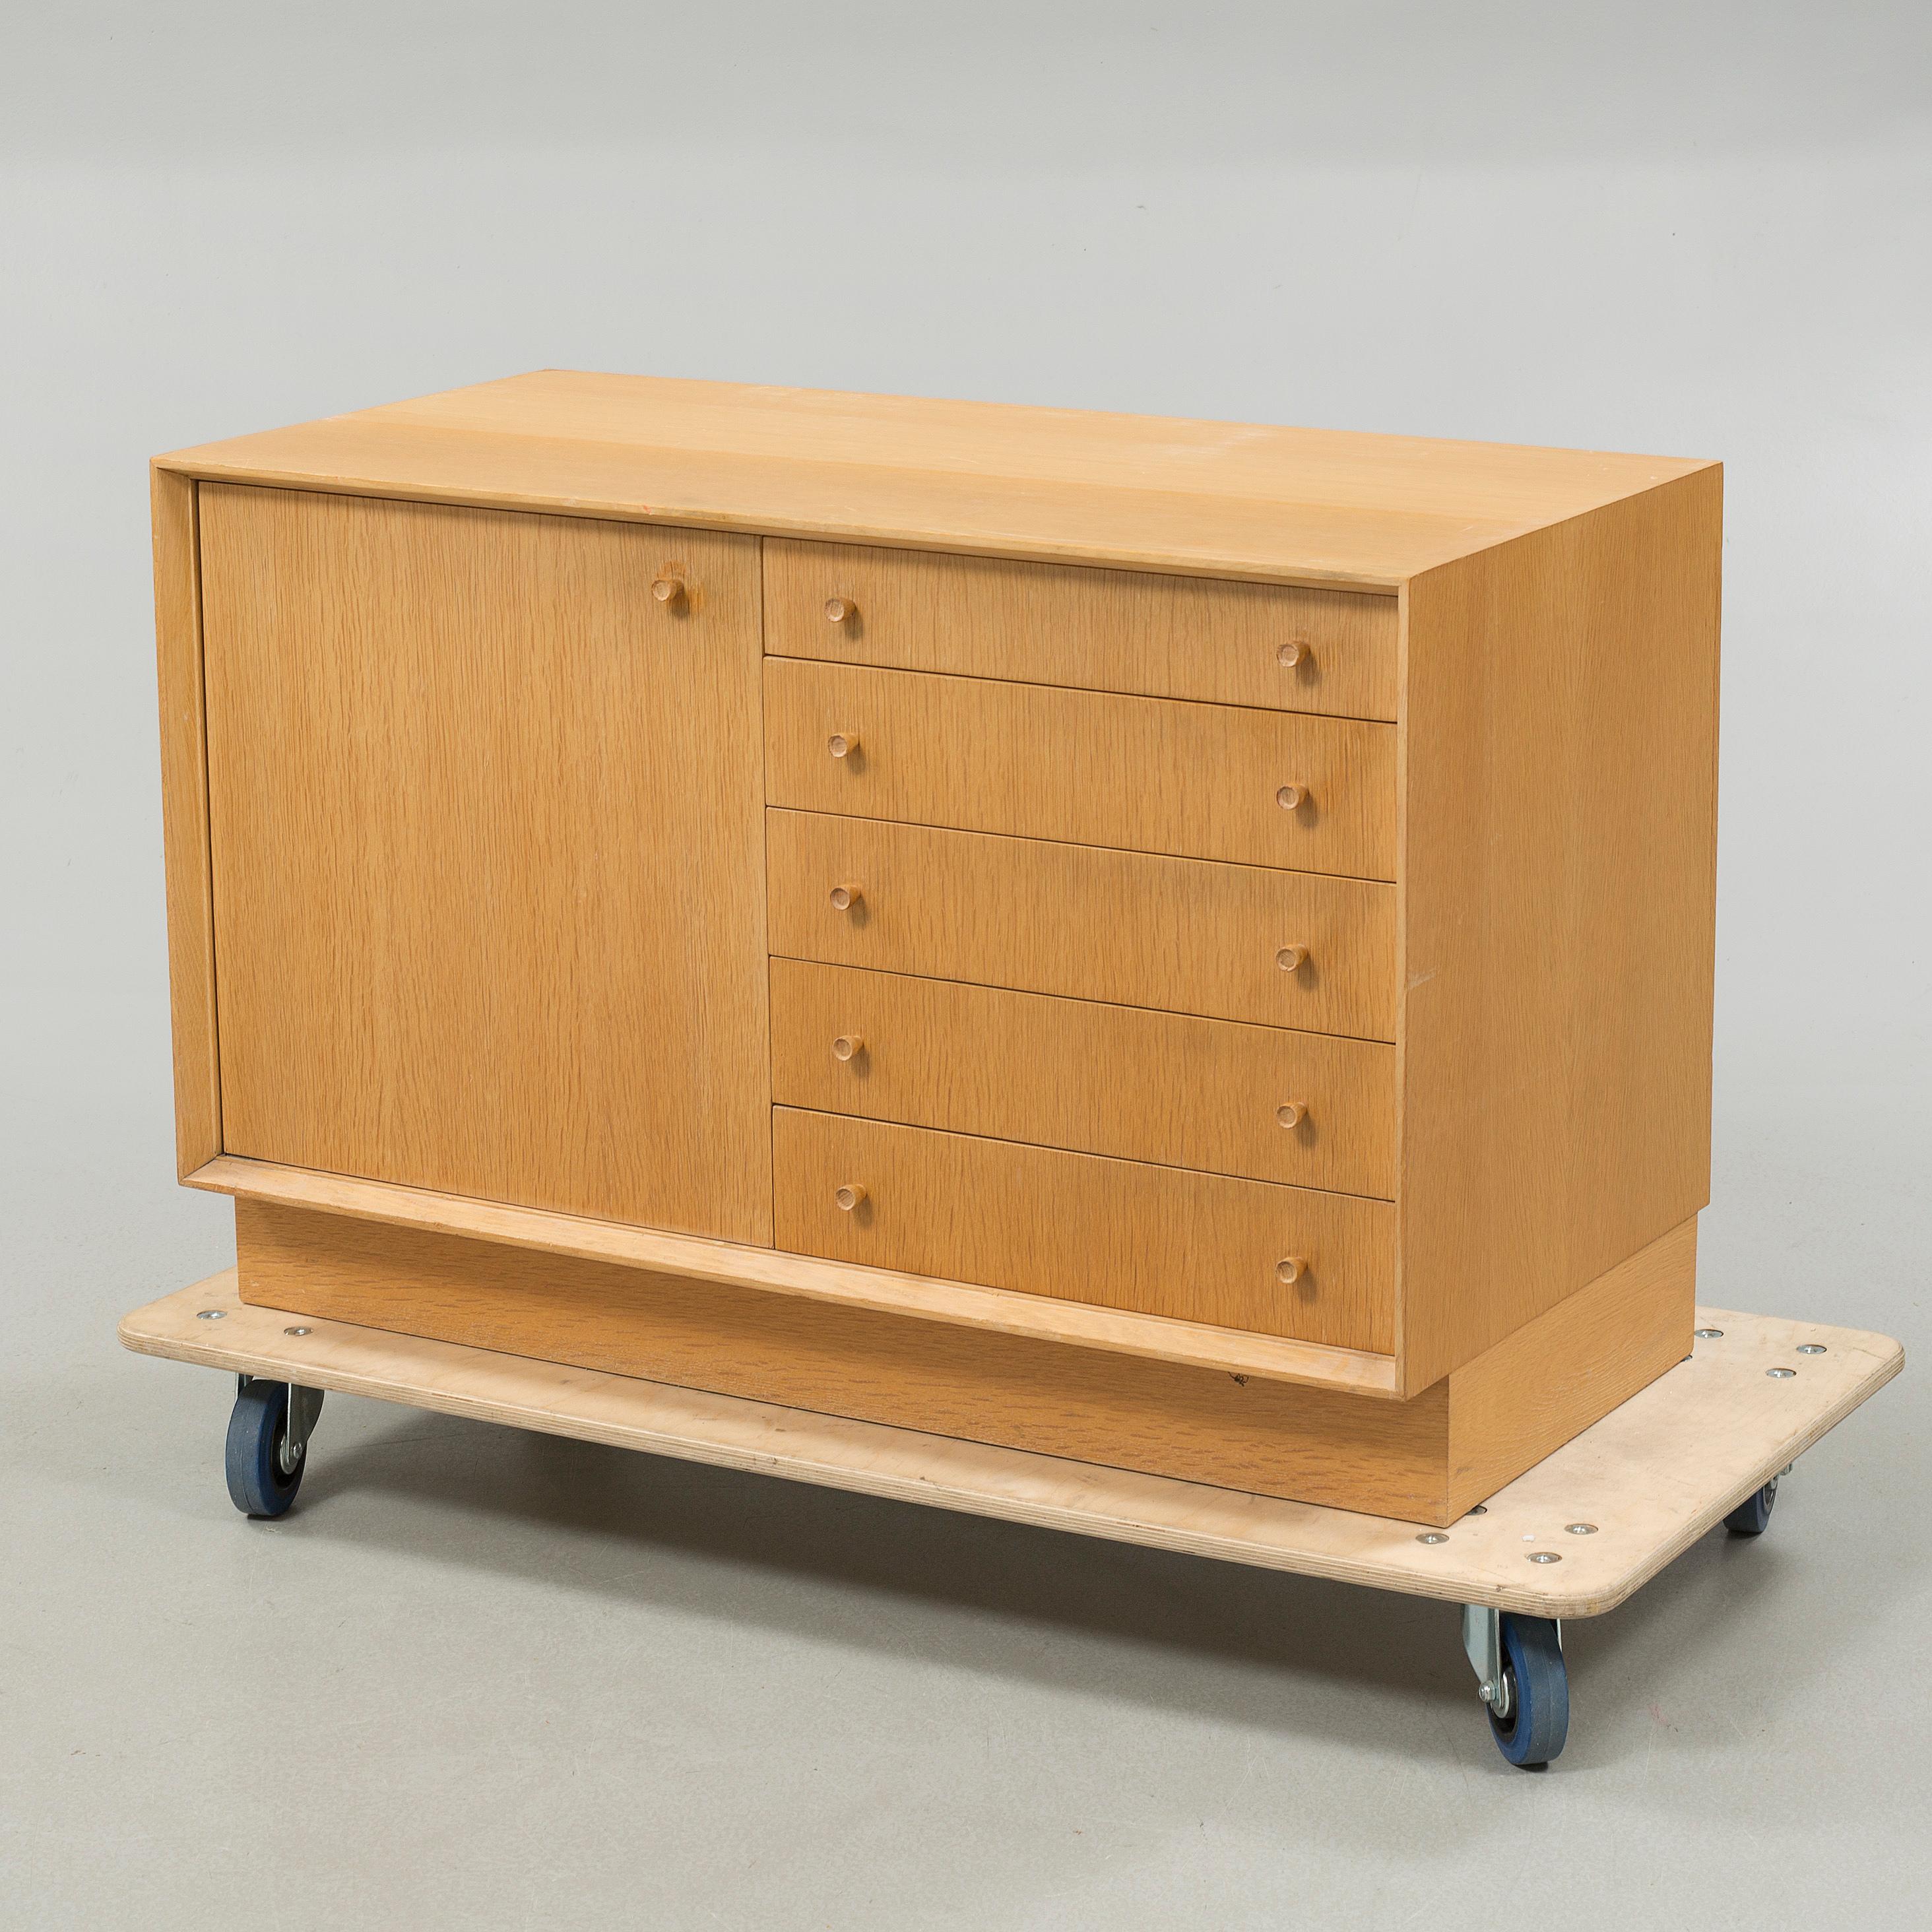 "A 1960s sideboard""Vistula"" by IKEA Bukowskis"